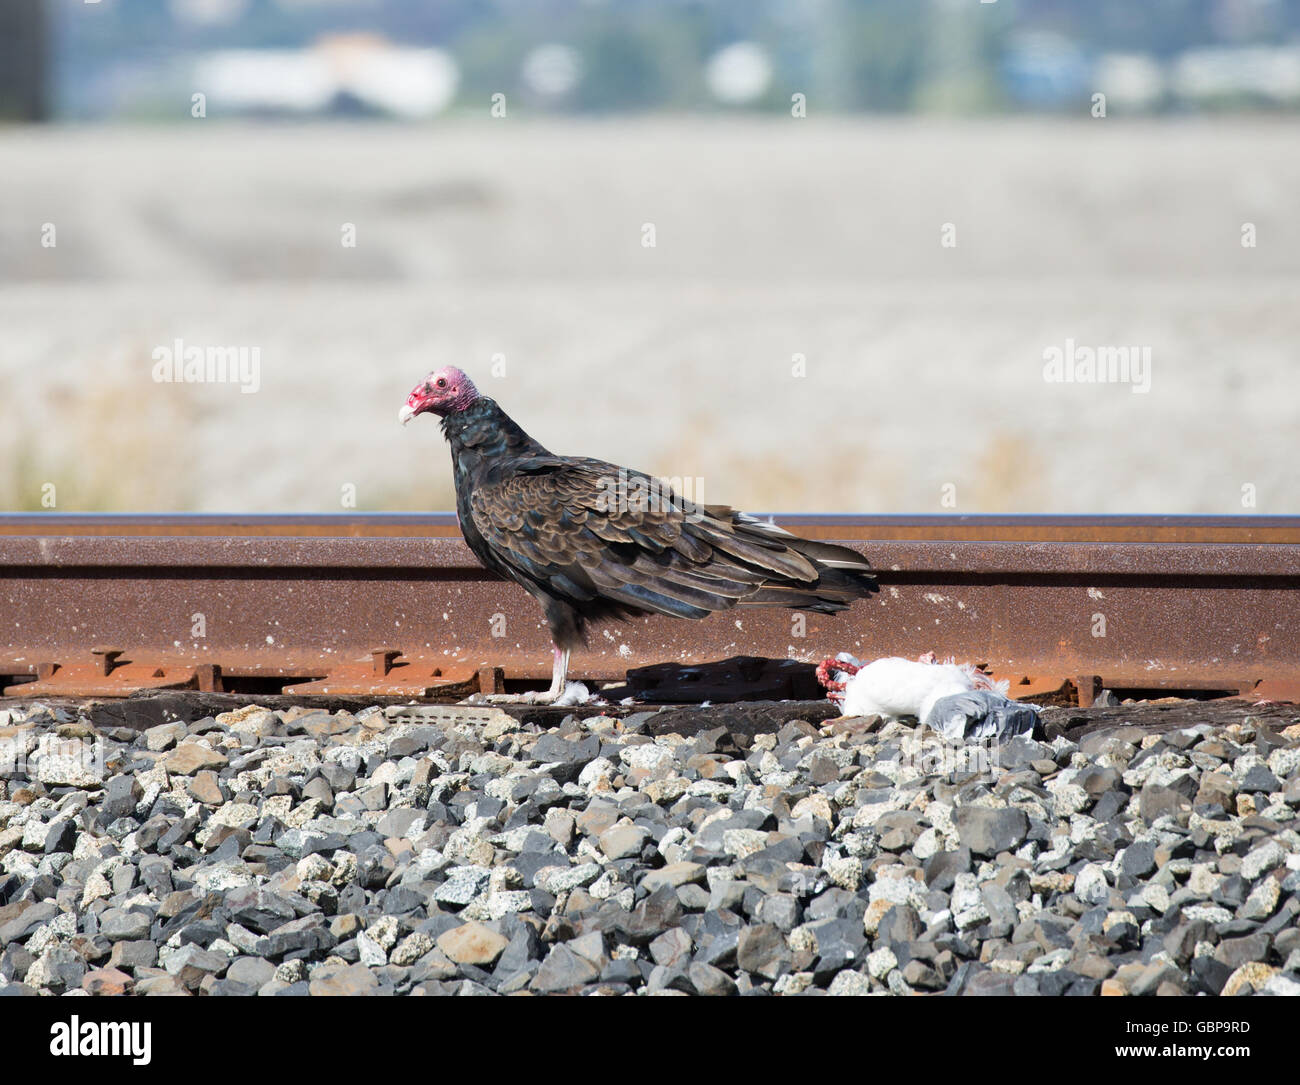 Bird with prey. Turkey Vulture - Cathartes aura, Alviso, CA - Stock Image